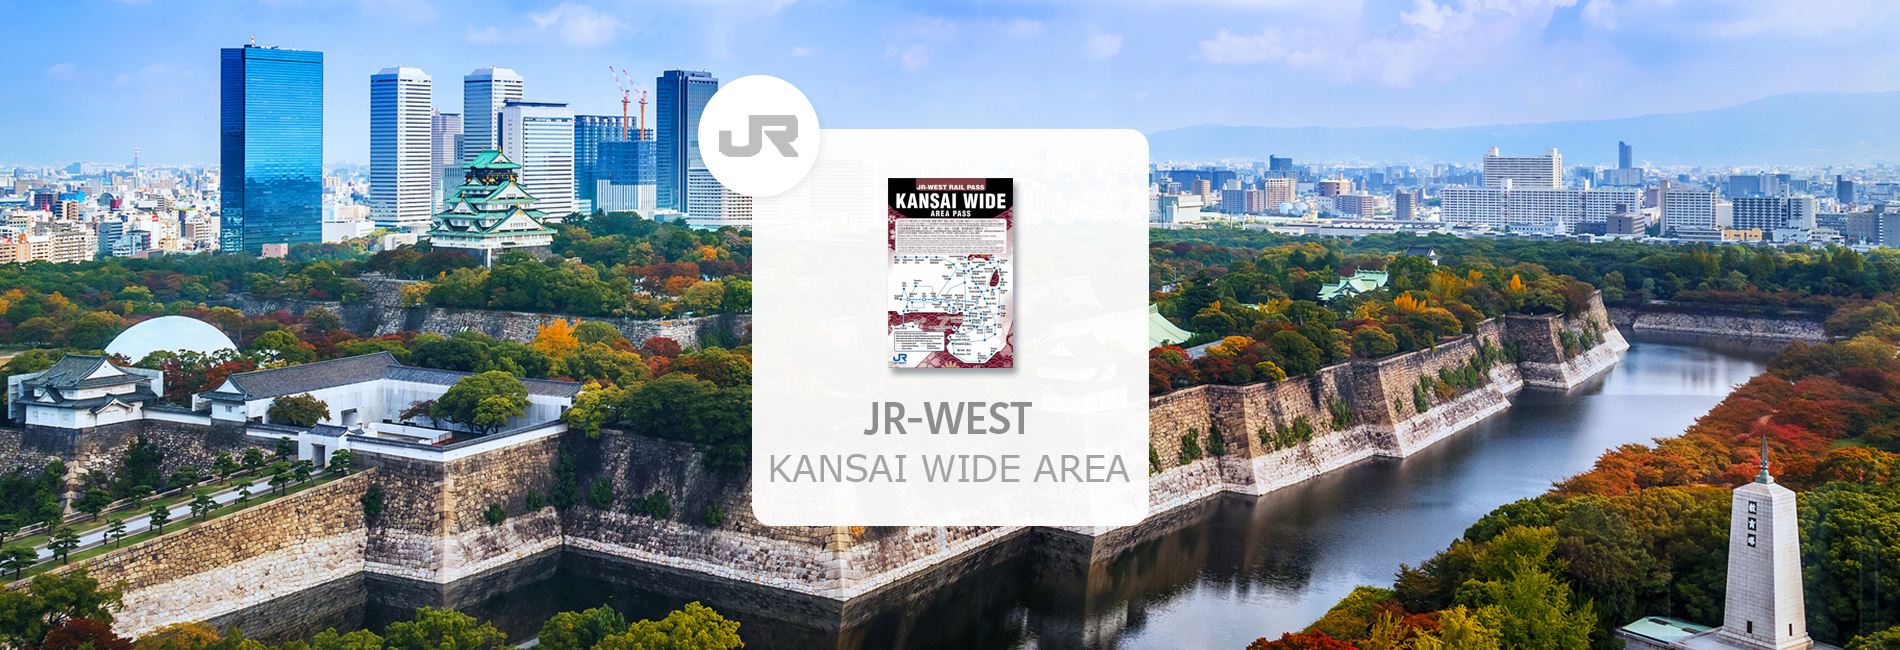 JR Kansai WIDE Area Pass (Pick-Up at Hong Kong International Airport)